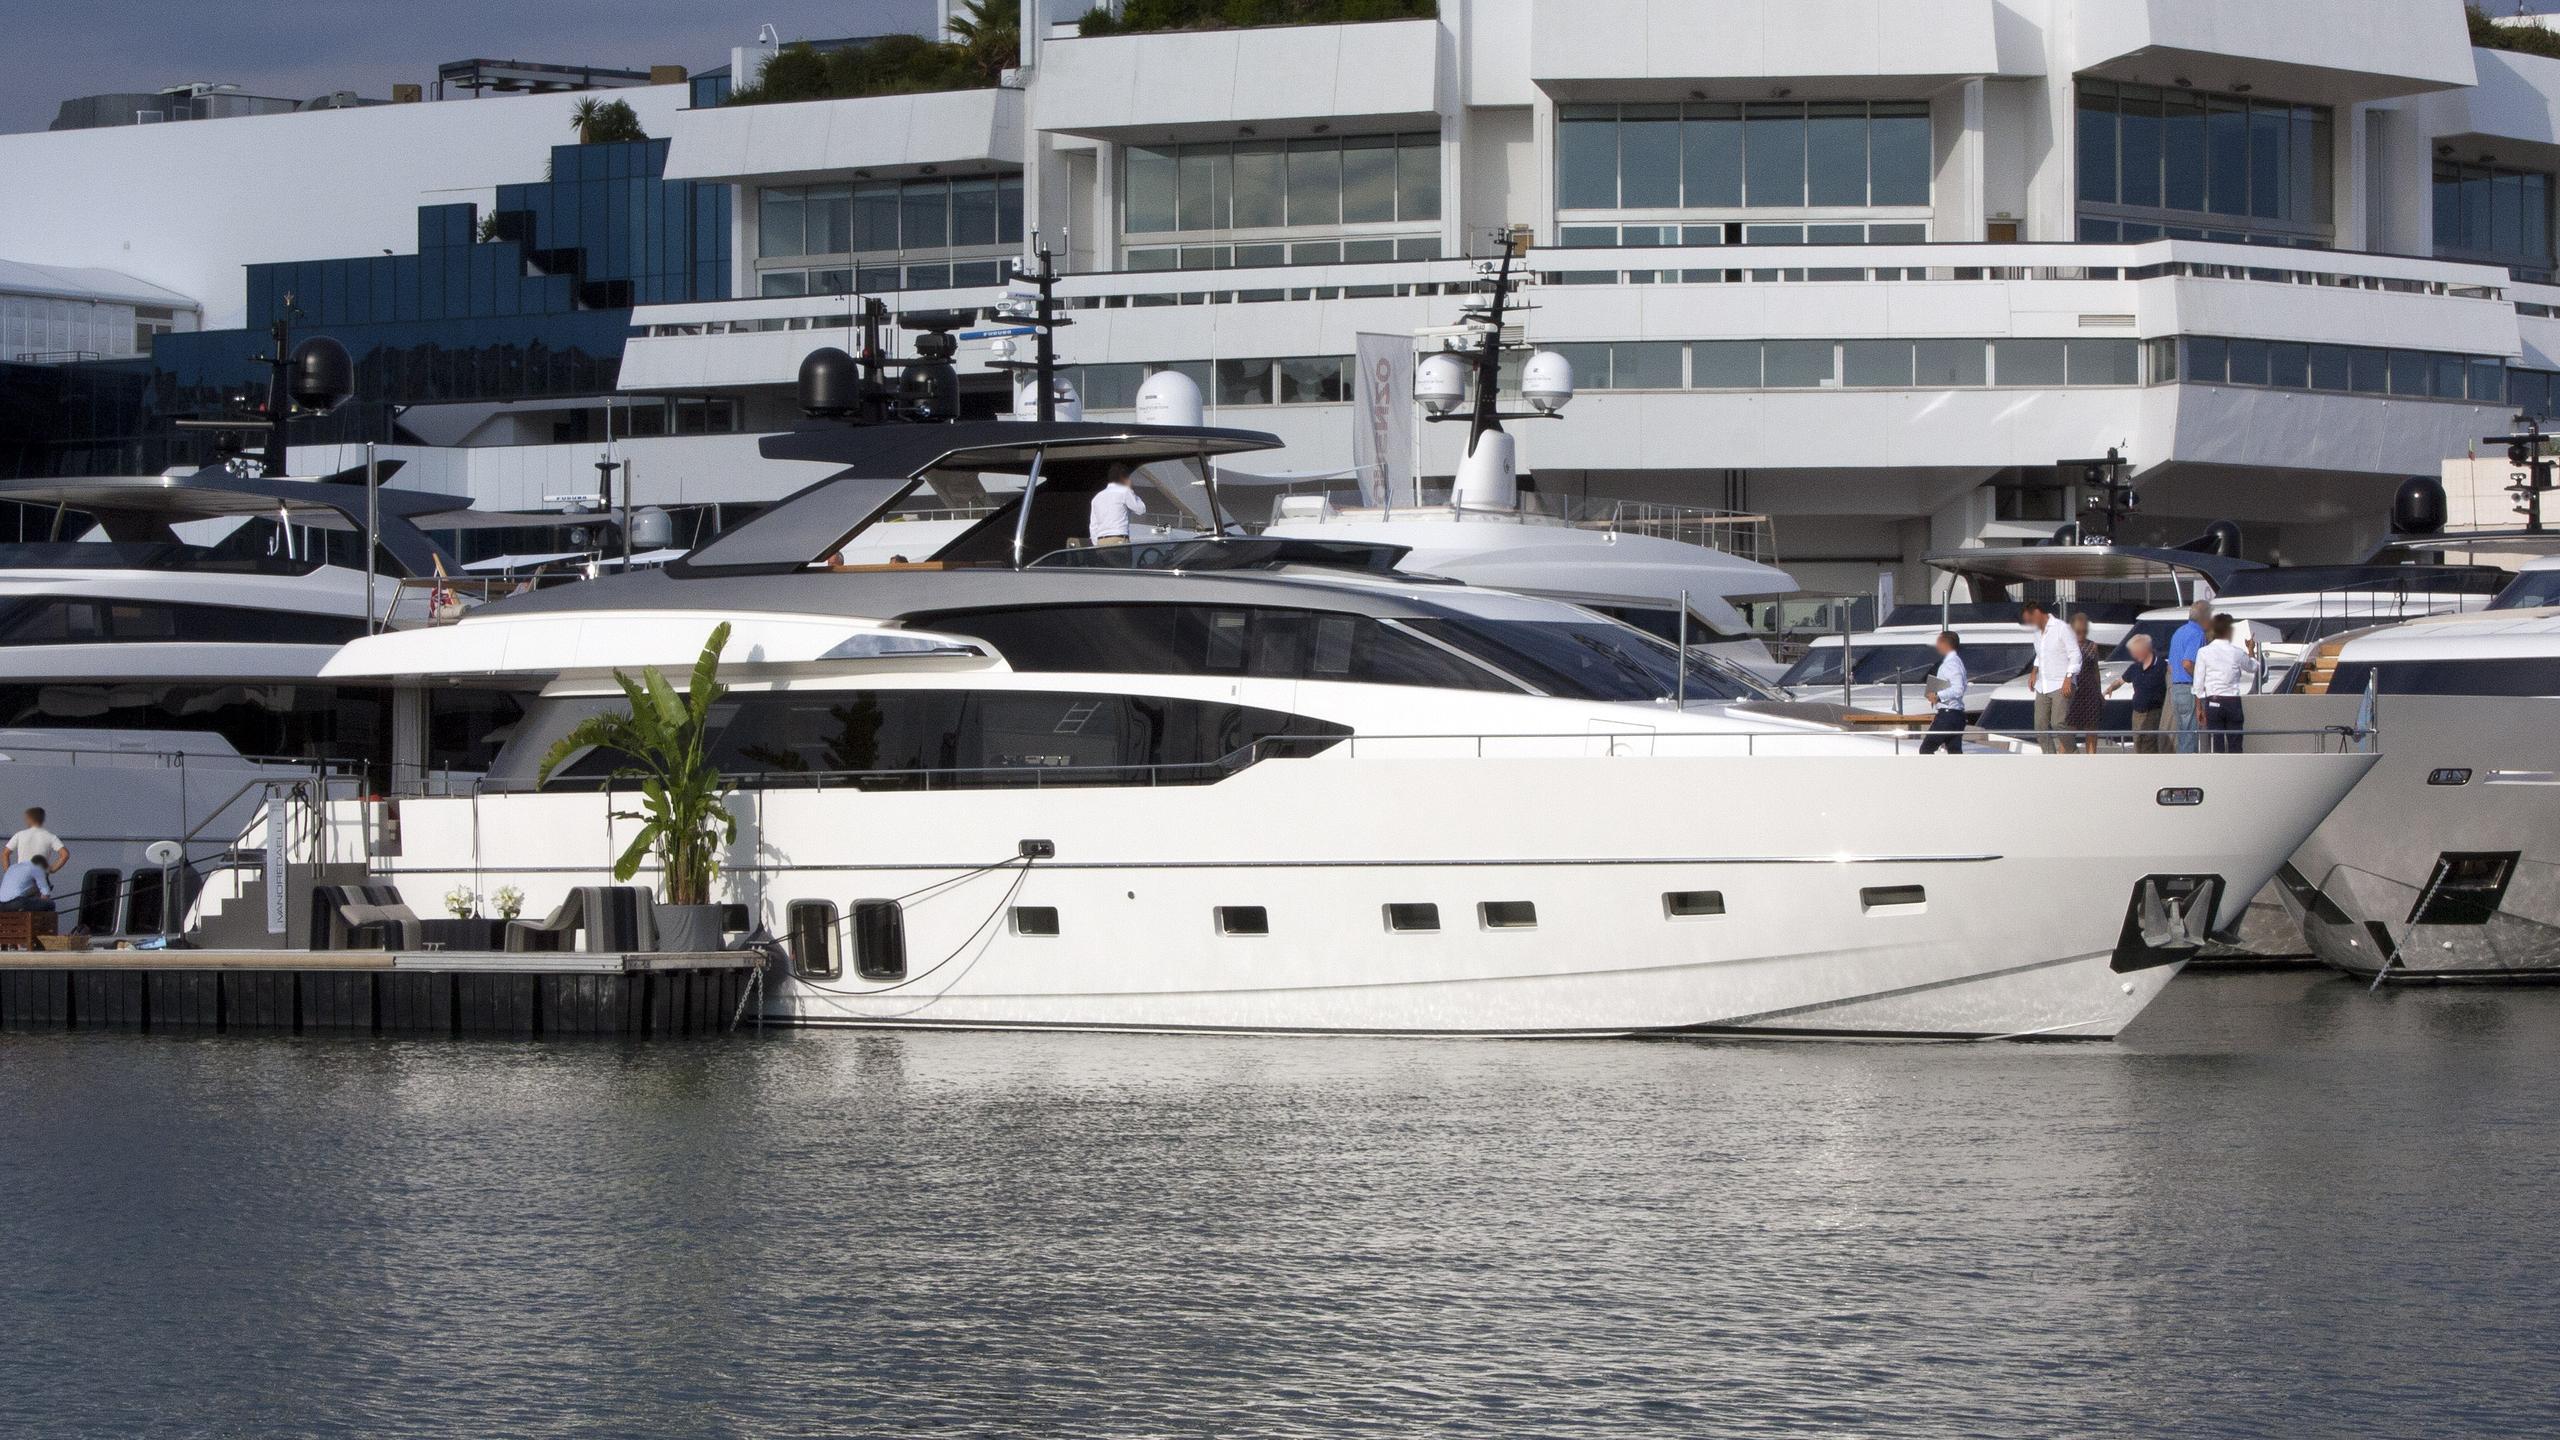 adriatic motor yacht sanlorenzo sl 86 2015 27m profile